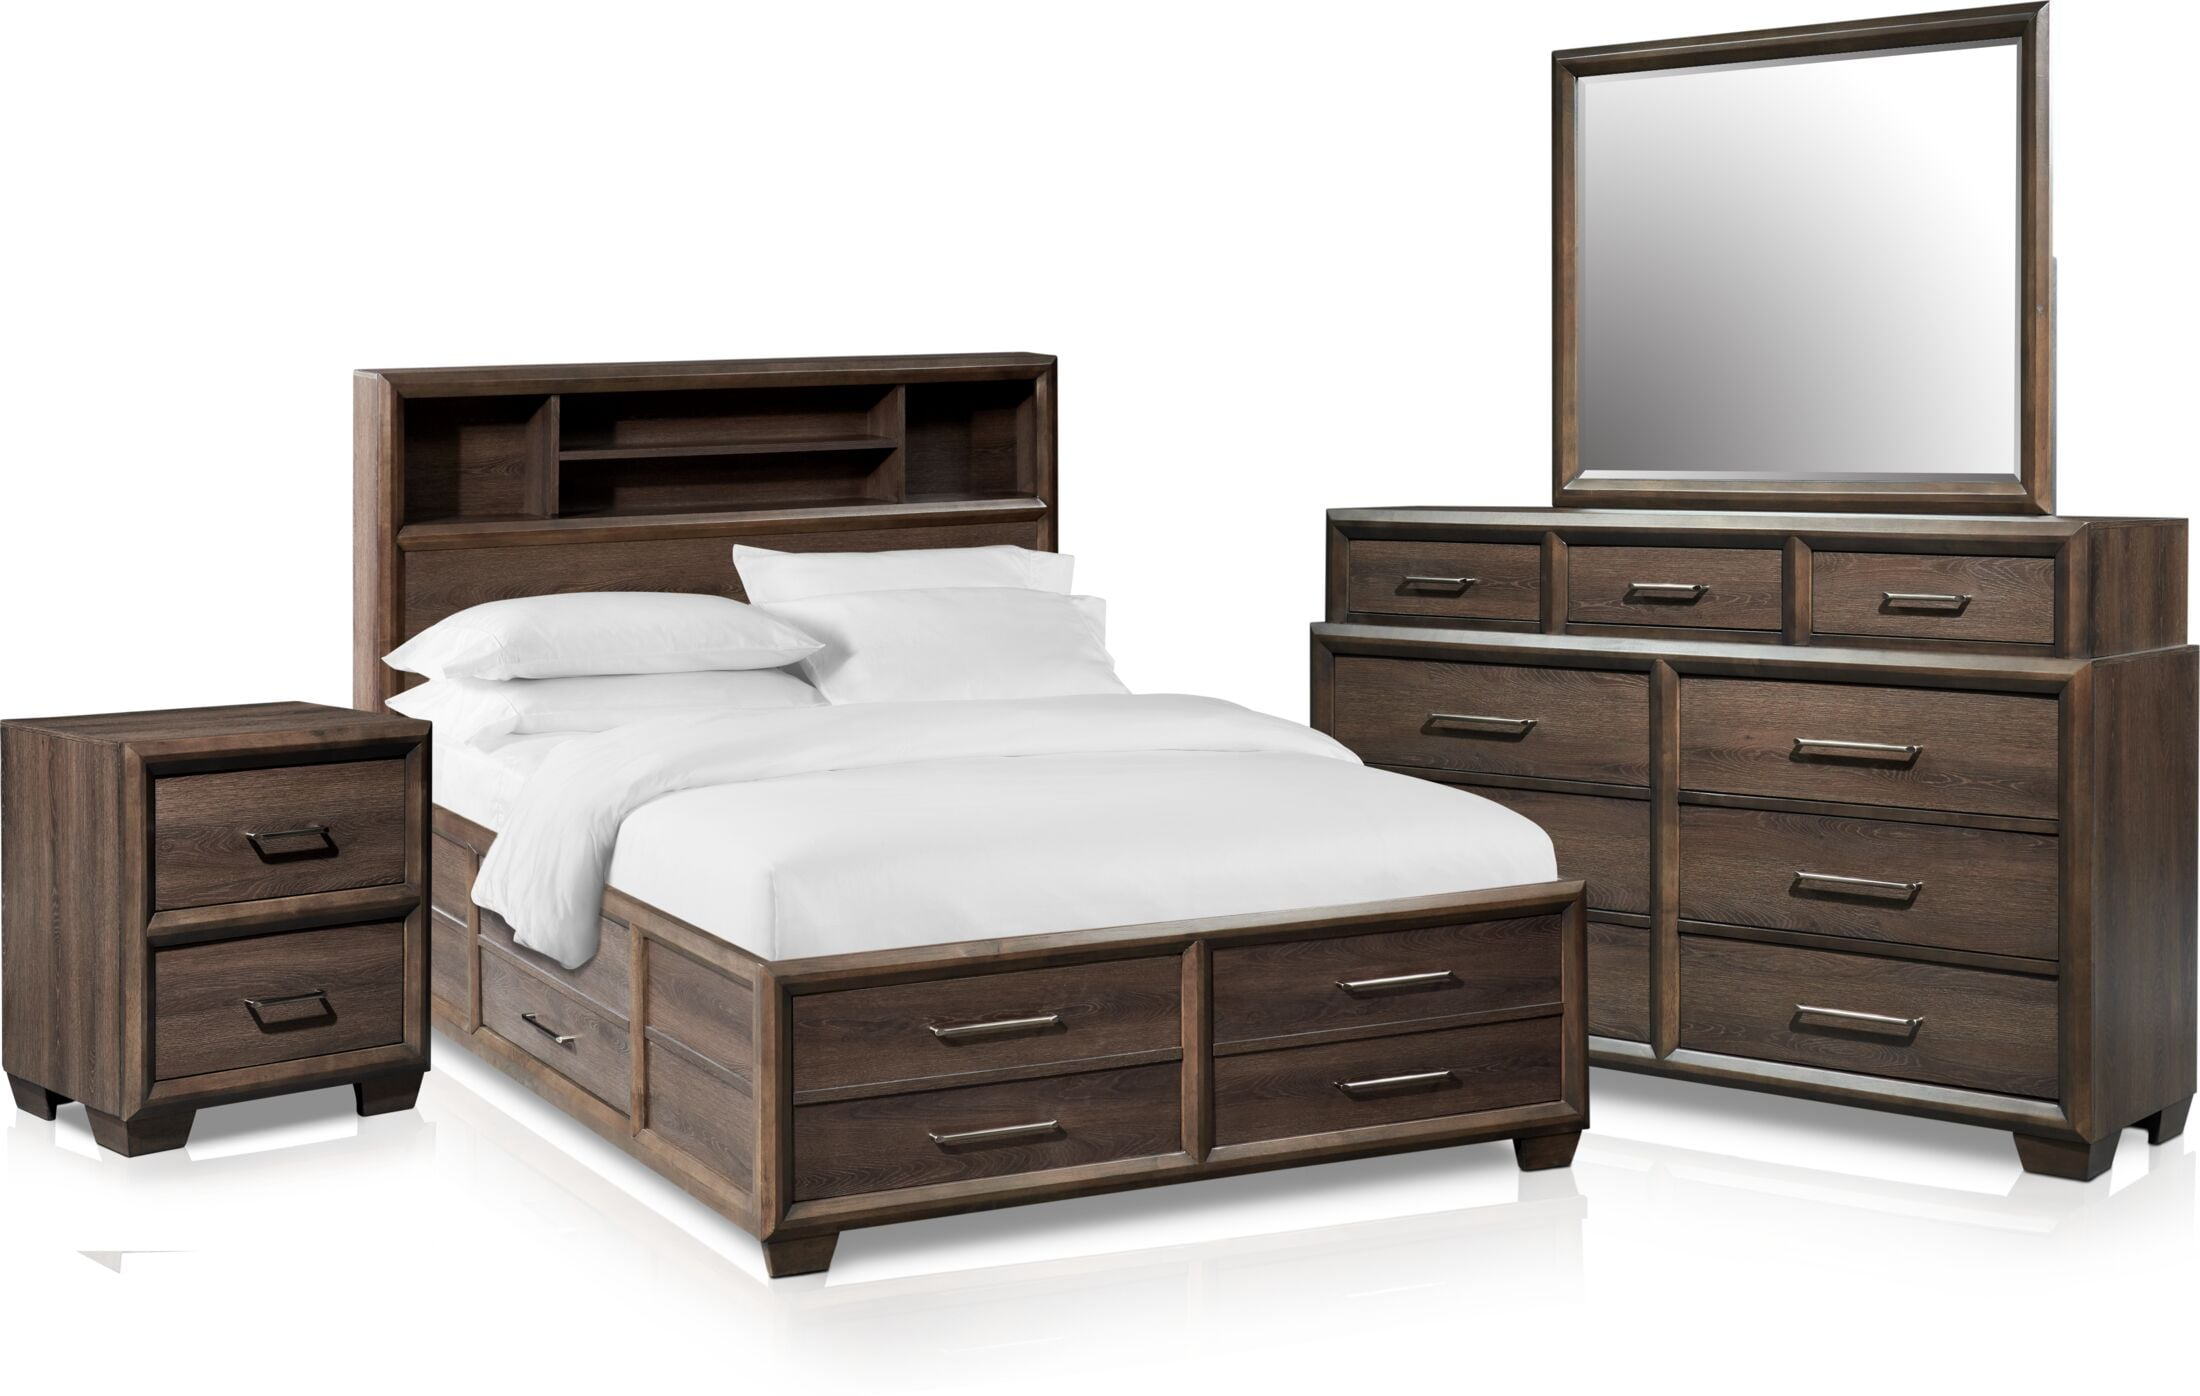 Bedroom Furniture - Dakota 6-Piece Bookcase Storage Bedroom Set with Nightstand, Dresser and Mirror